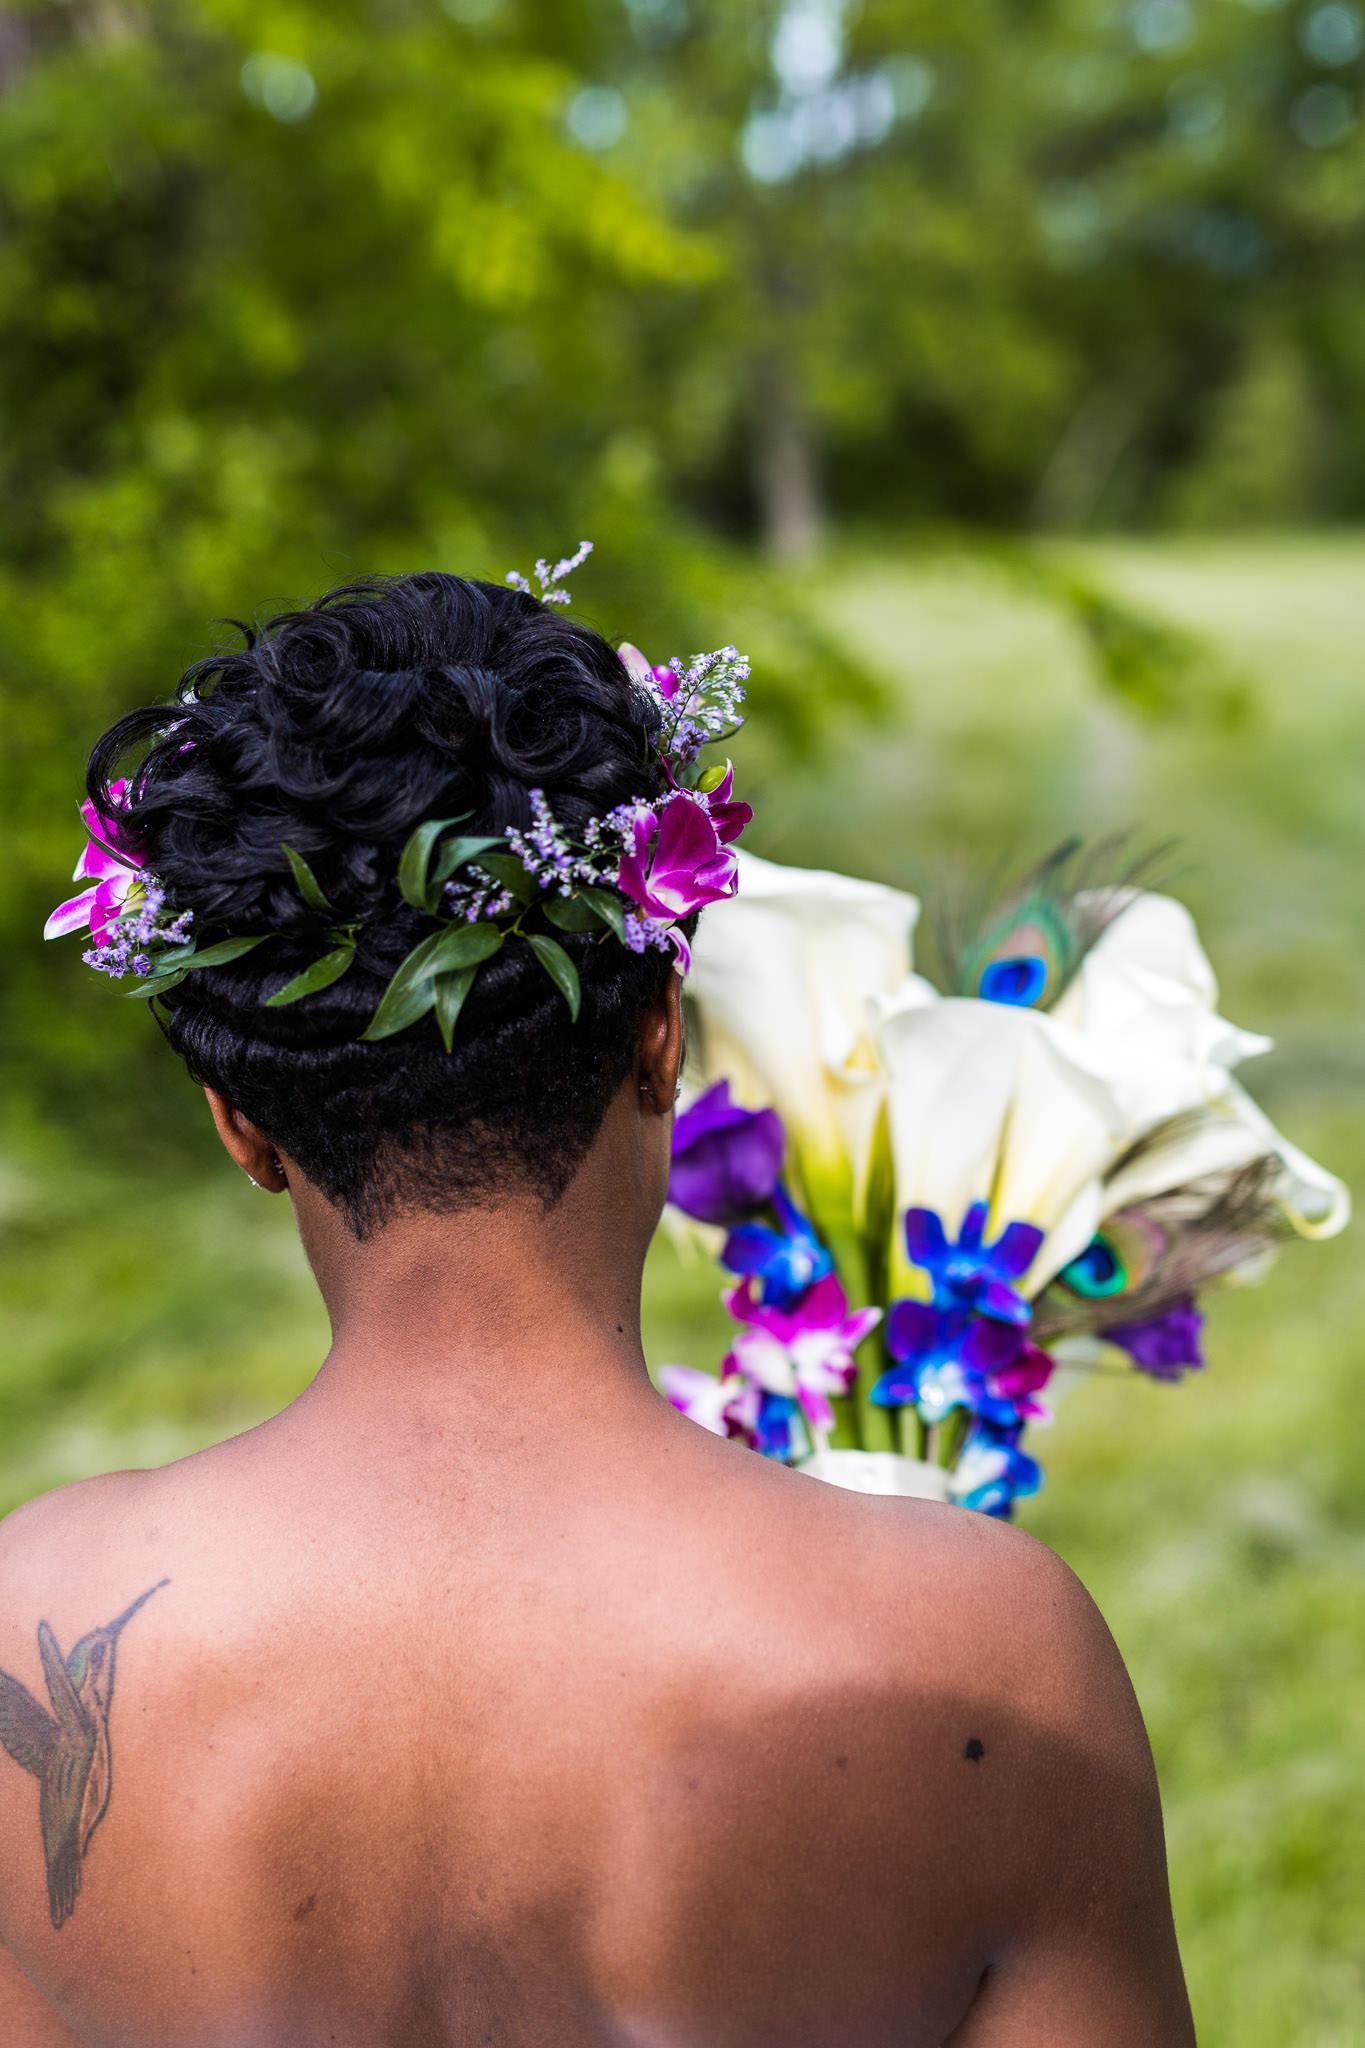 st-louis-photographer-machinist-hall-wedding-21.jpg